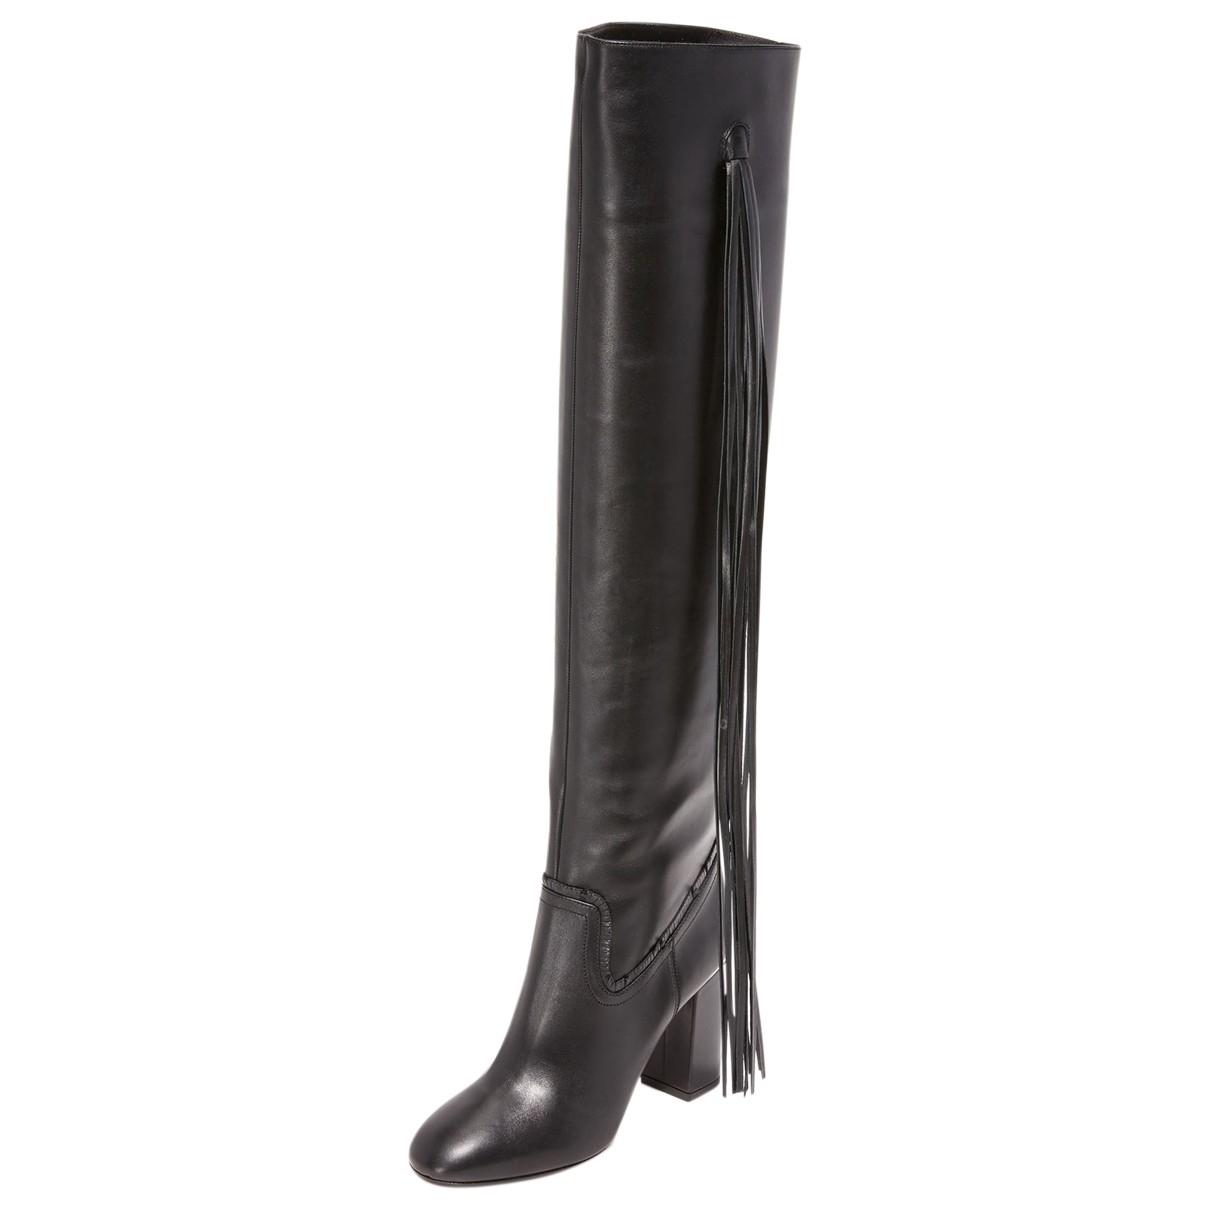 Aquazzura N Black Leather Boots for Women 38 EU